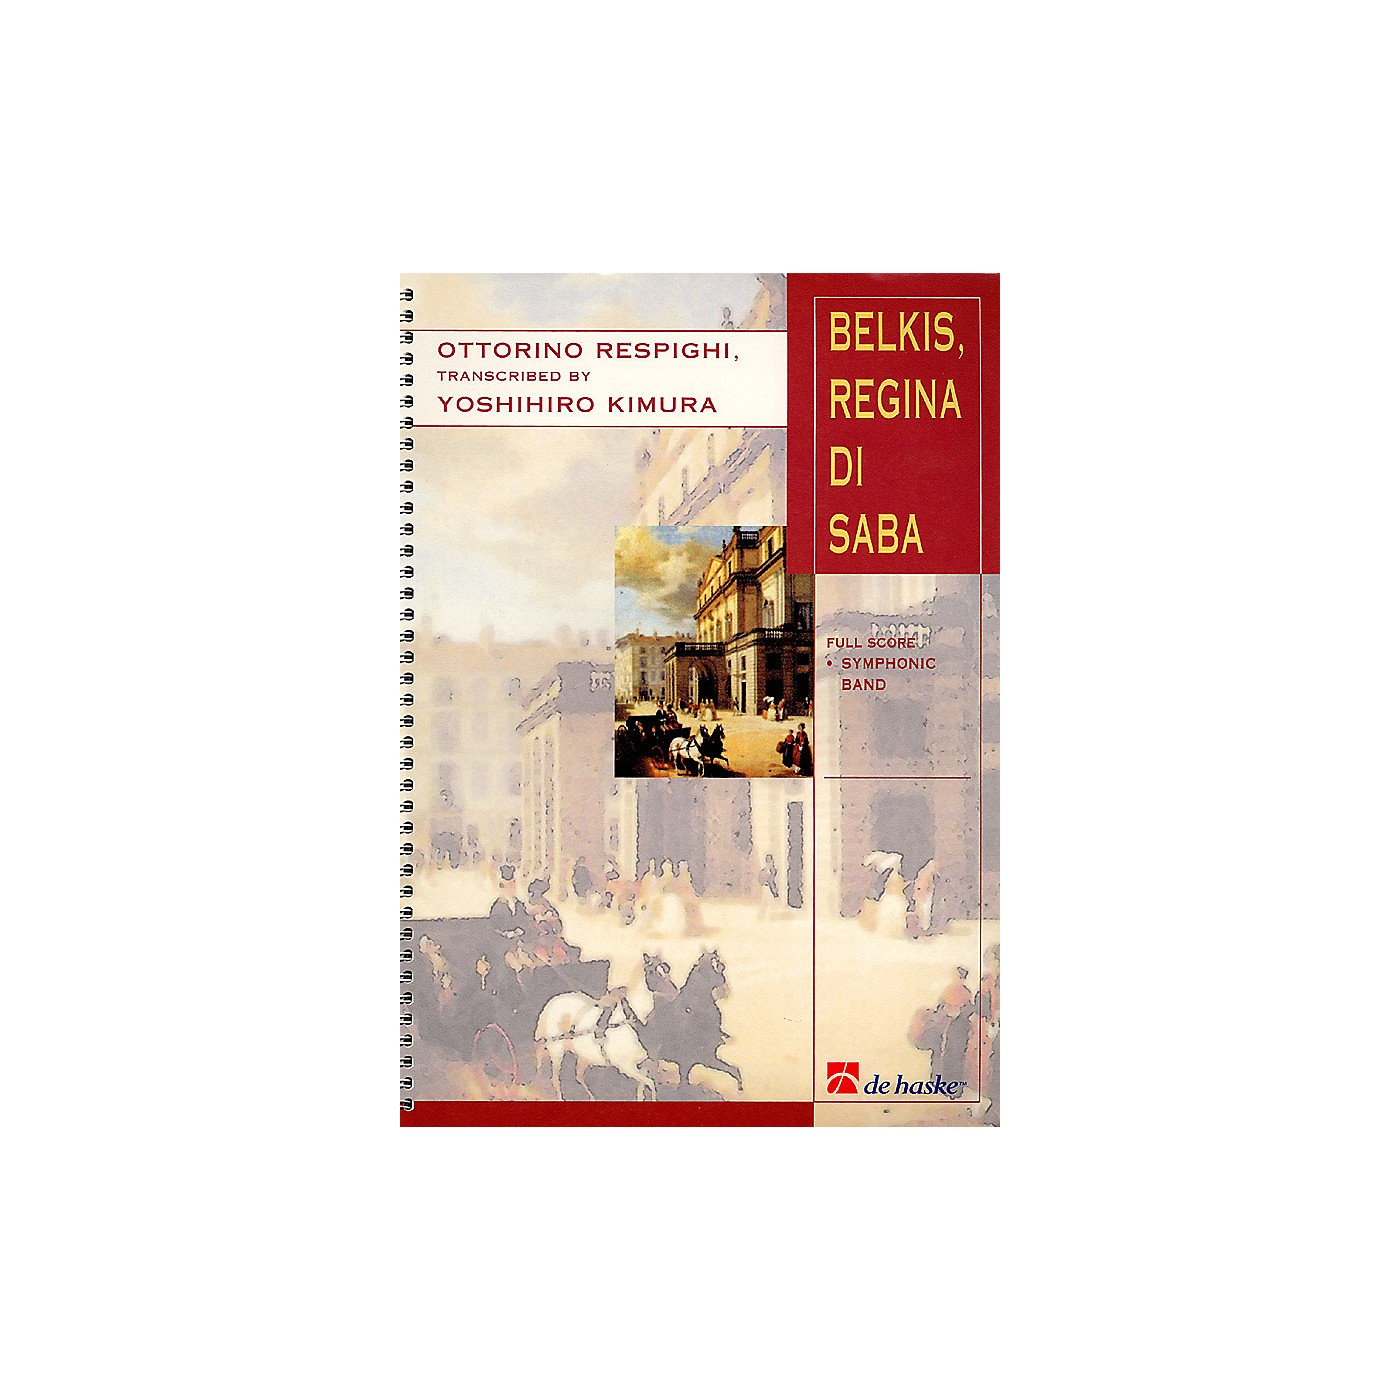 Hal Leonard Belkis, Regina Di Saba (part Ii) Score Only Concert Band thumbnail